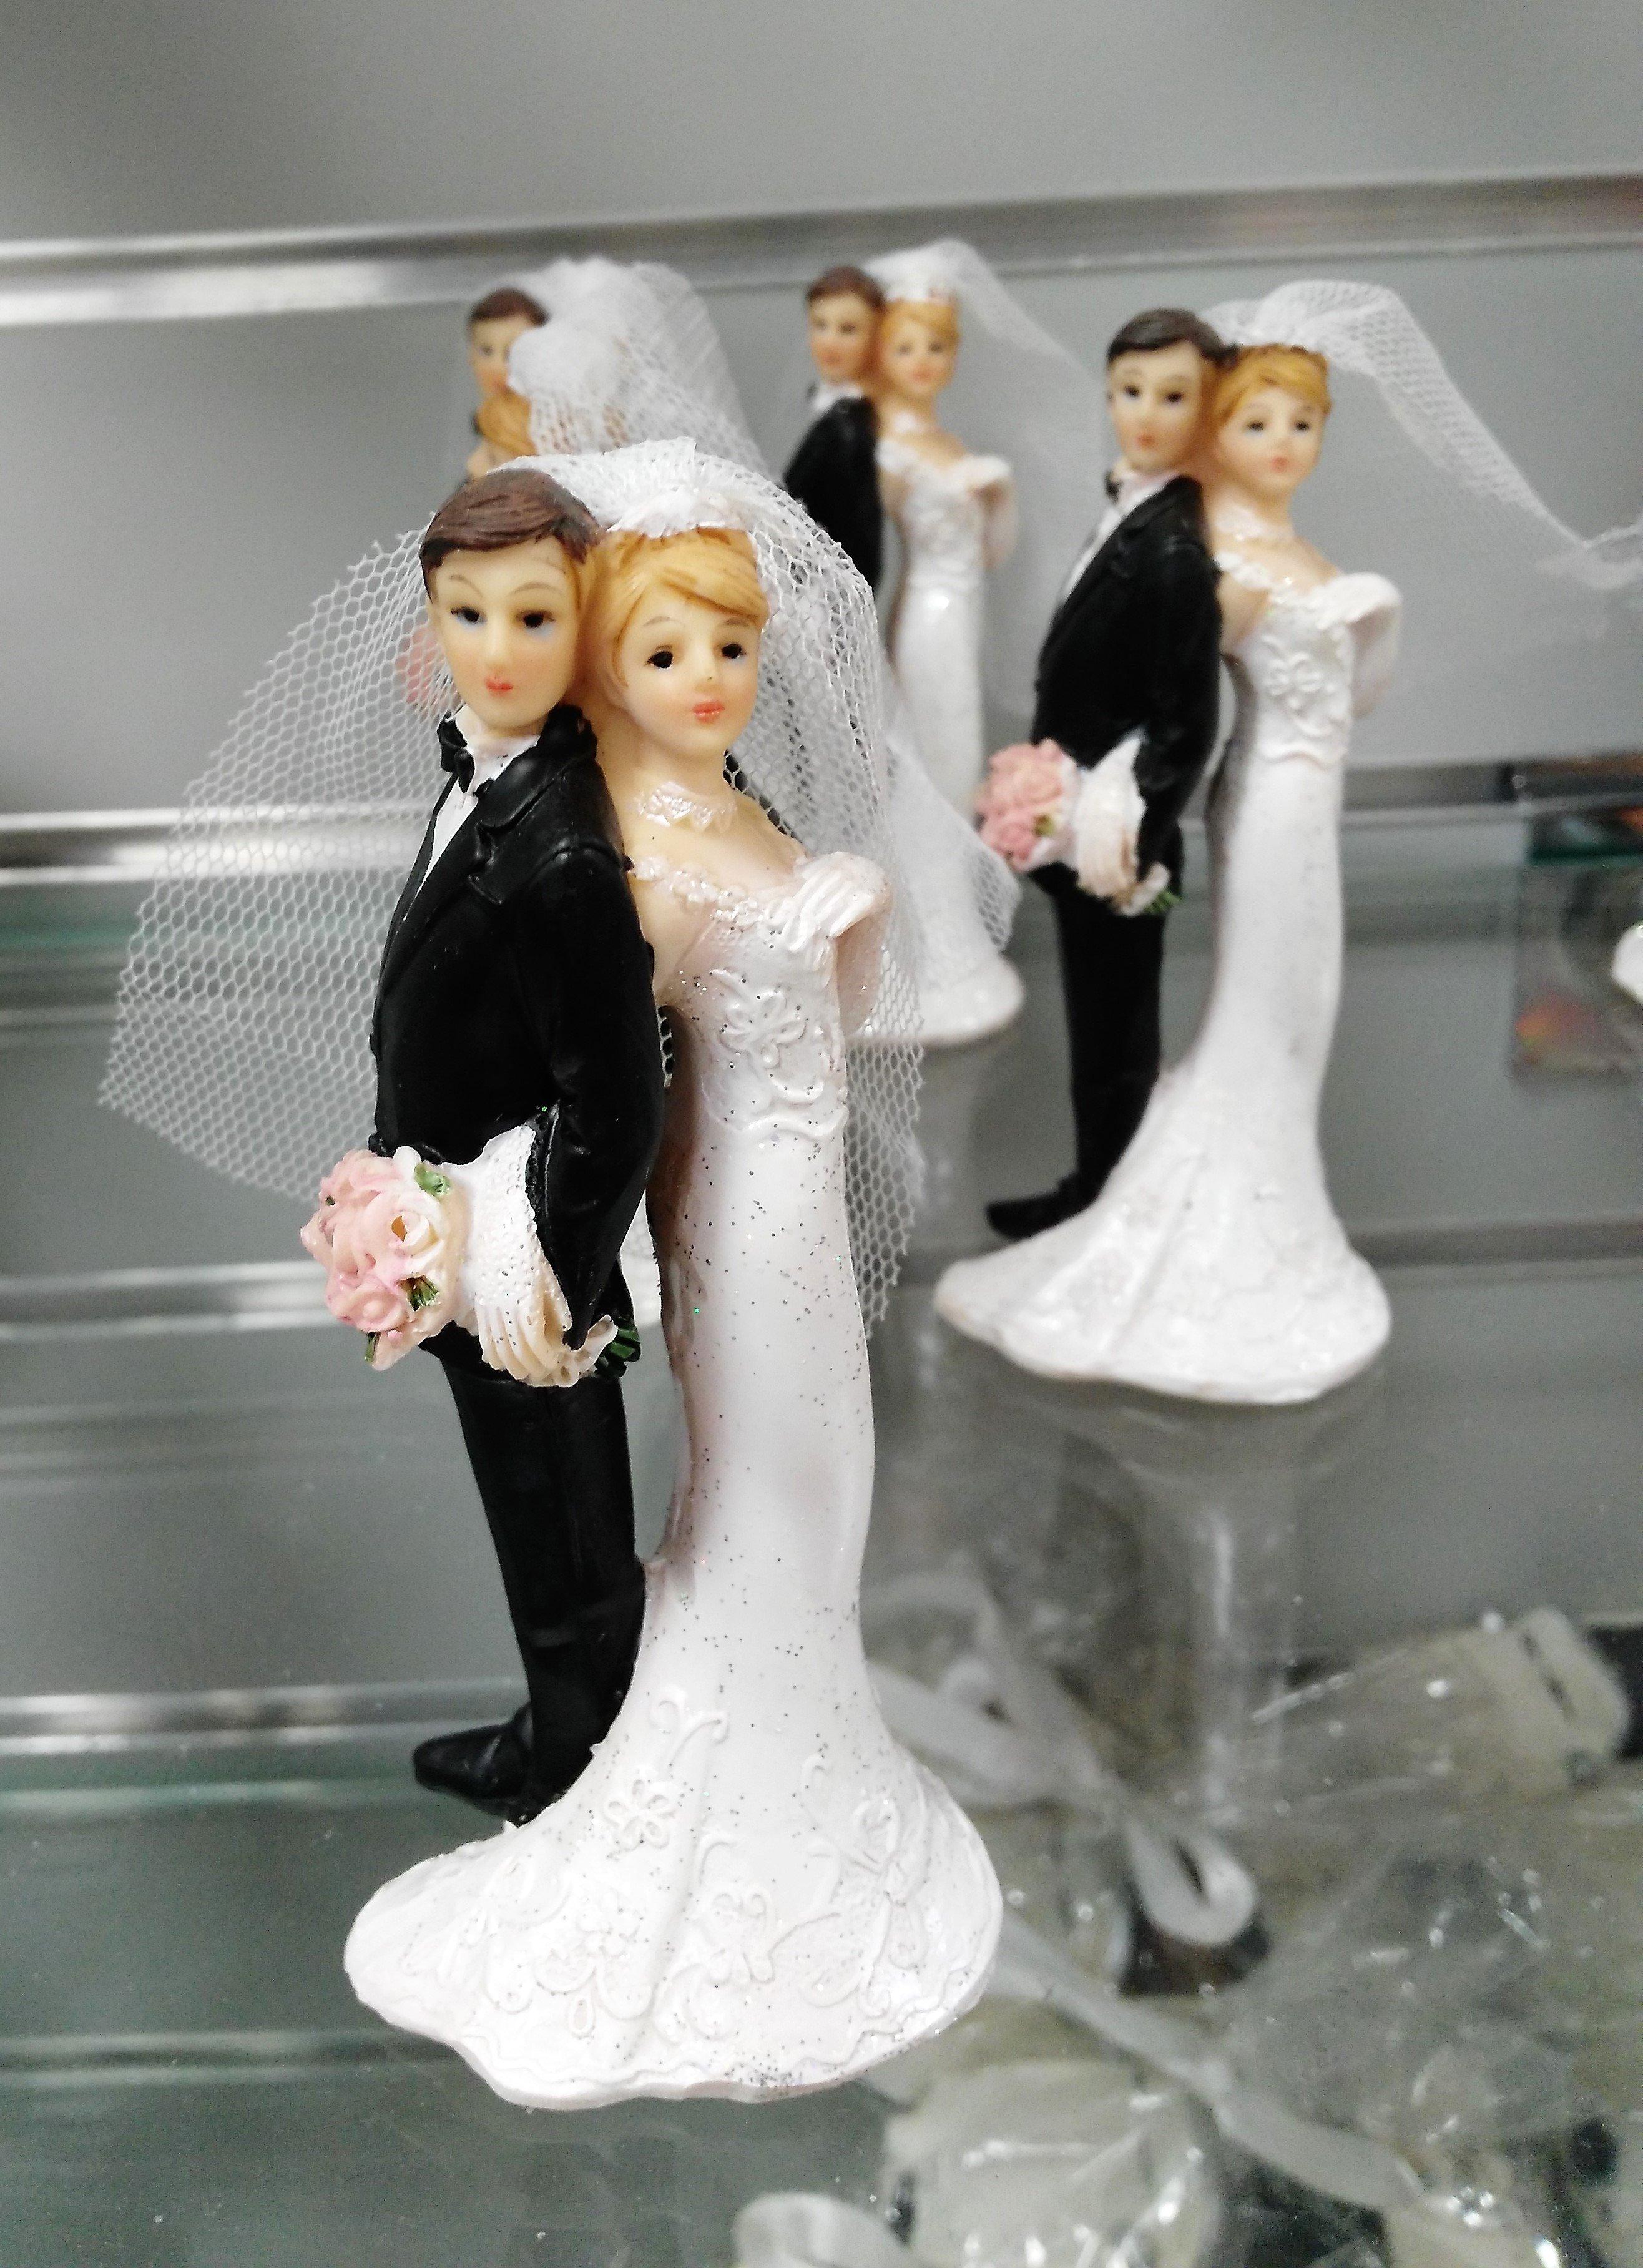 Matrimonio ma perchè fai da te